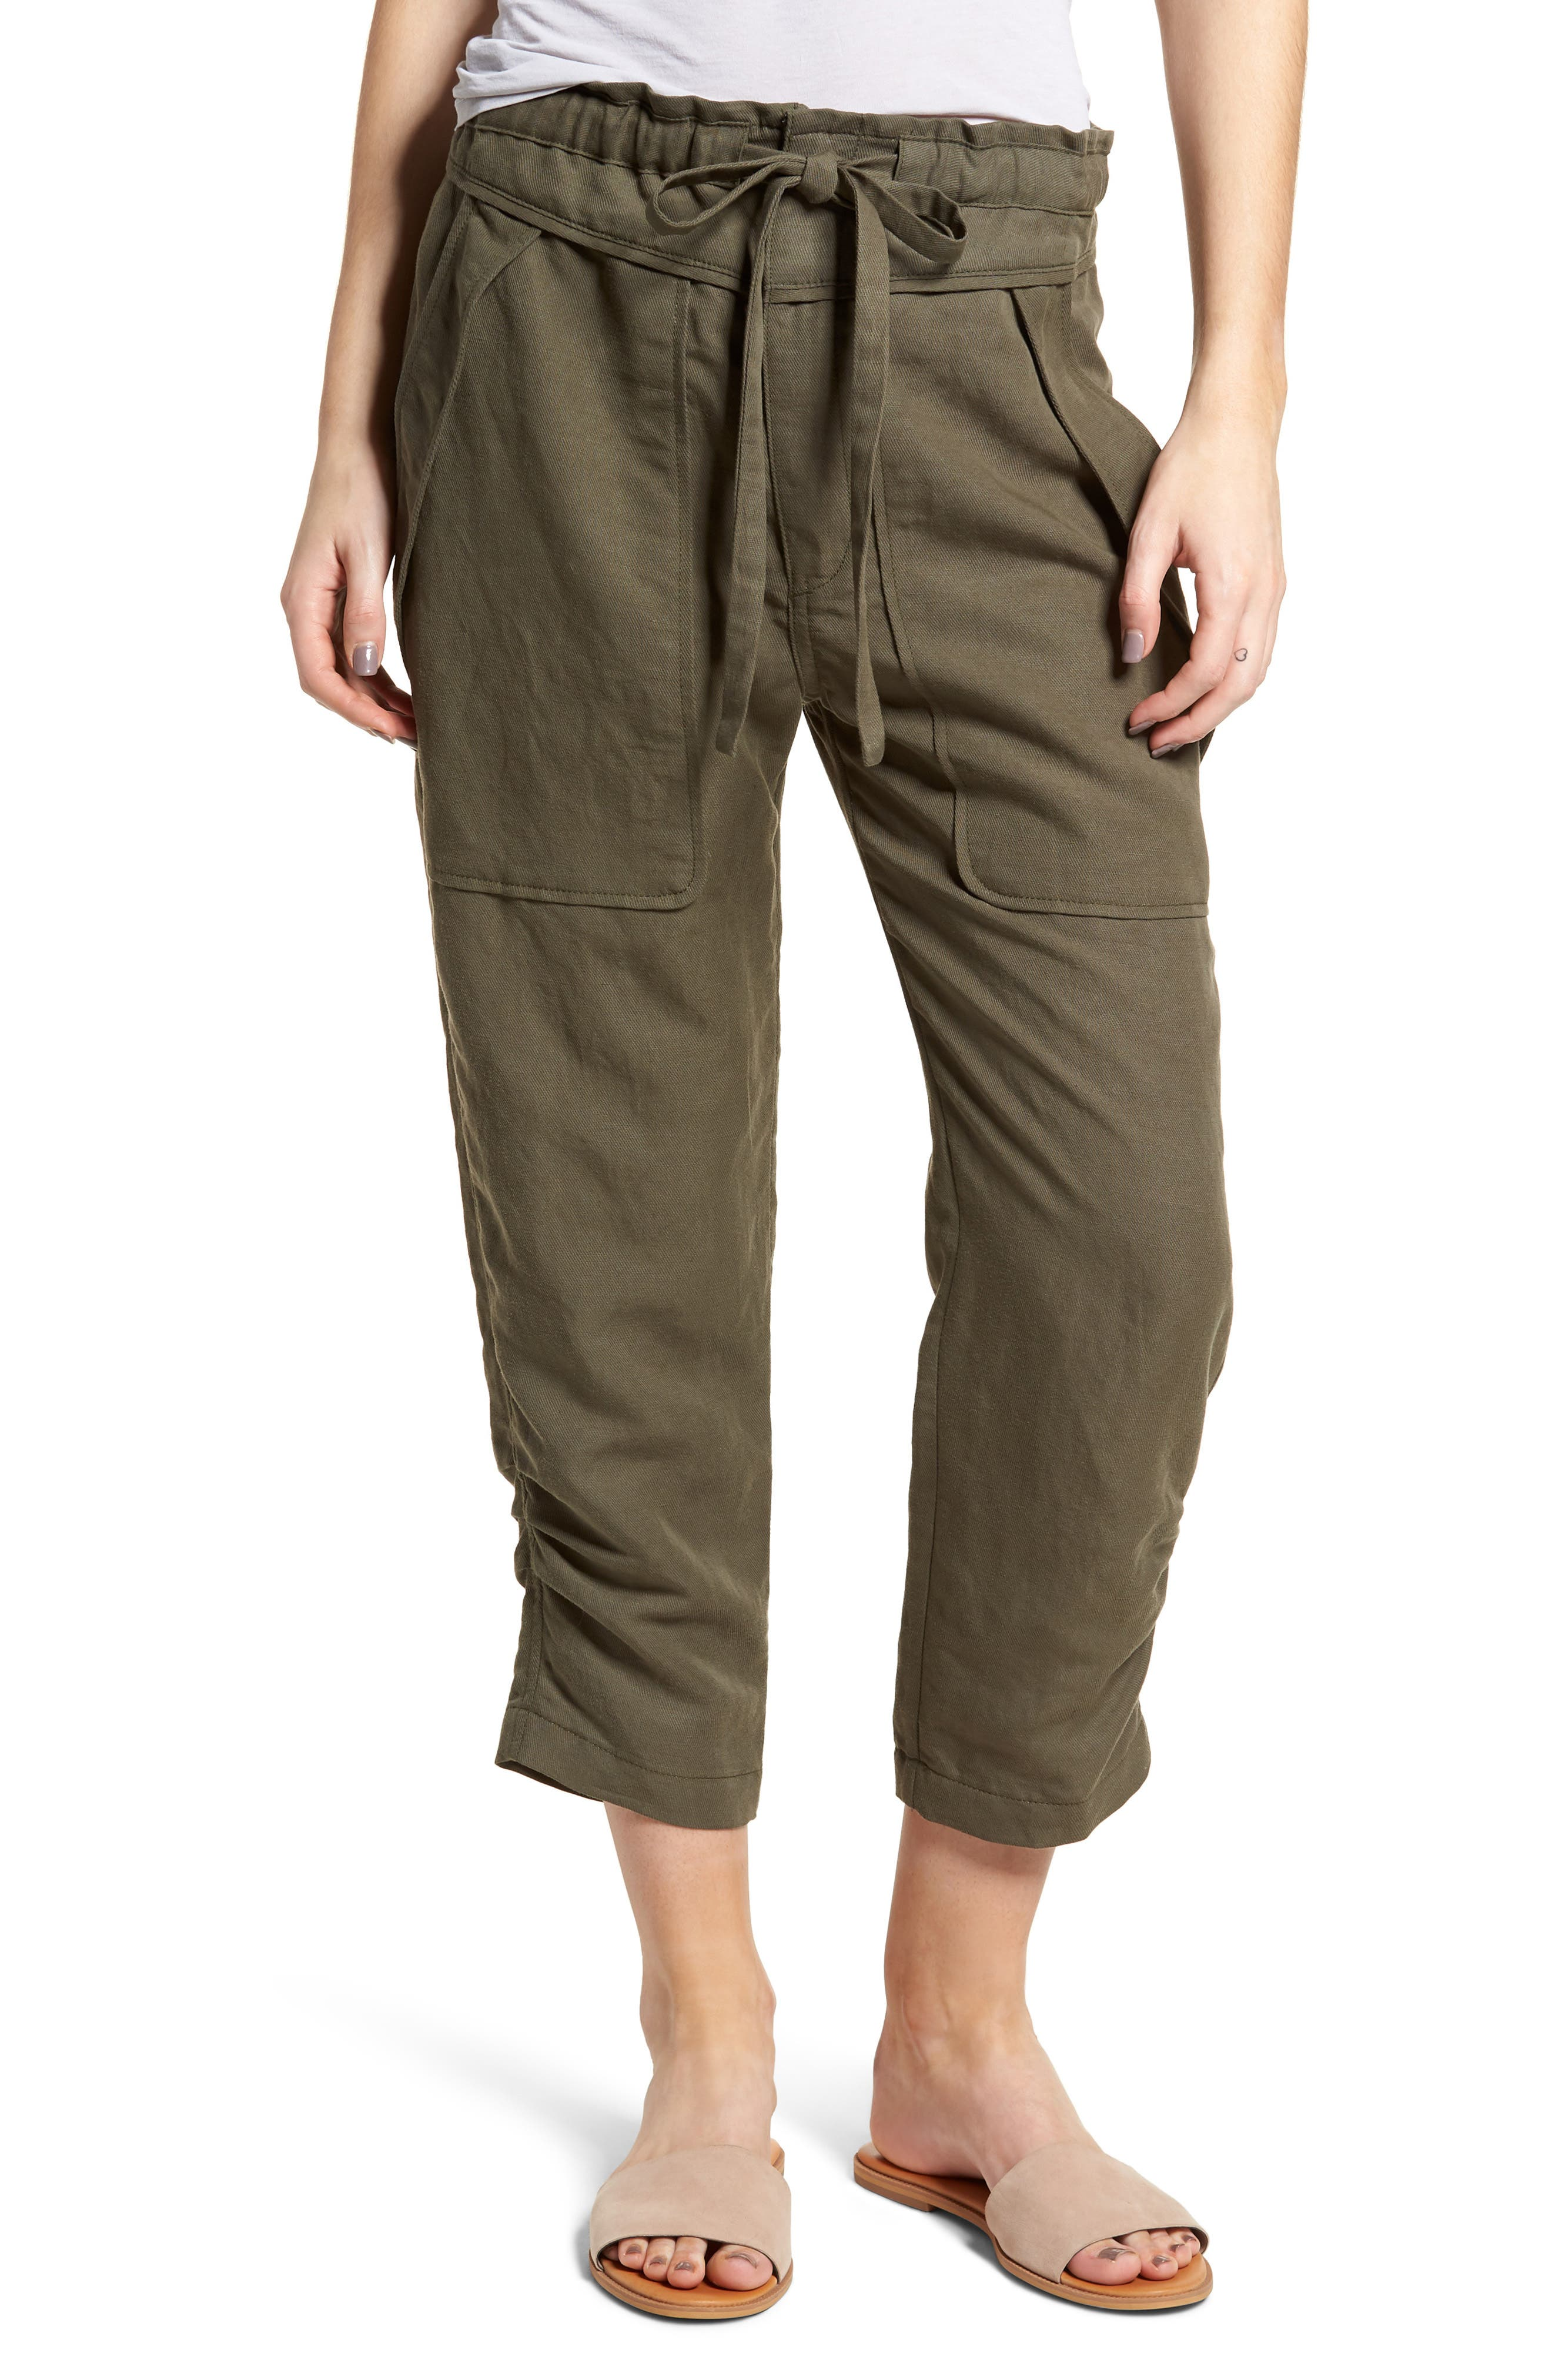 Stellina High Waist Pants,                         Main,                         color, Verdant